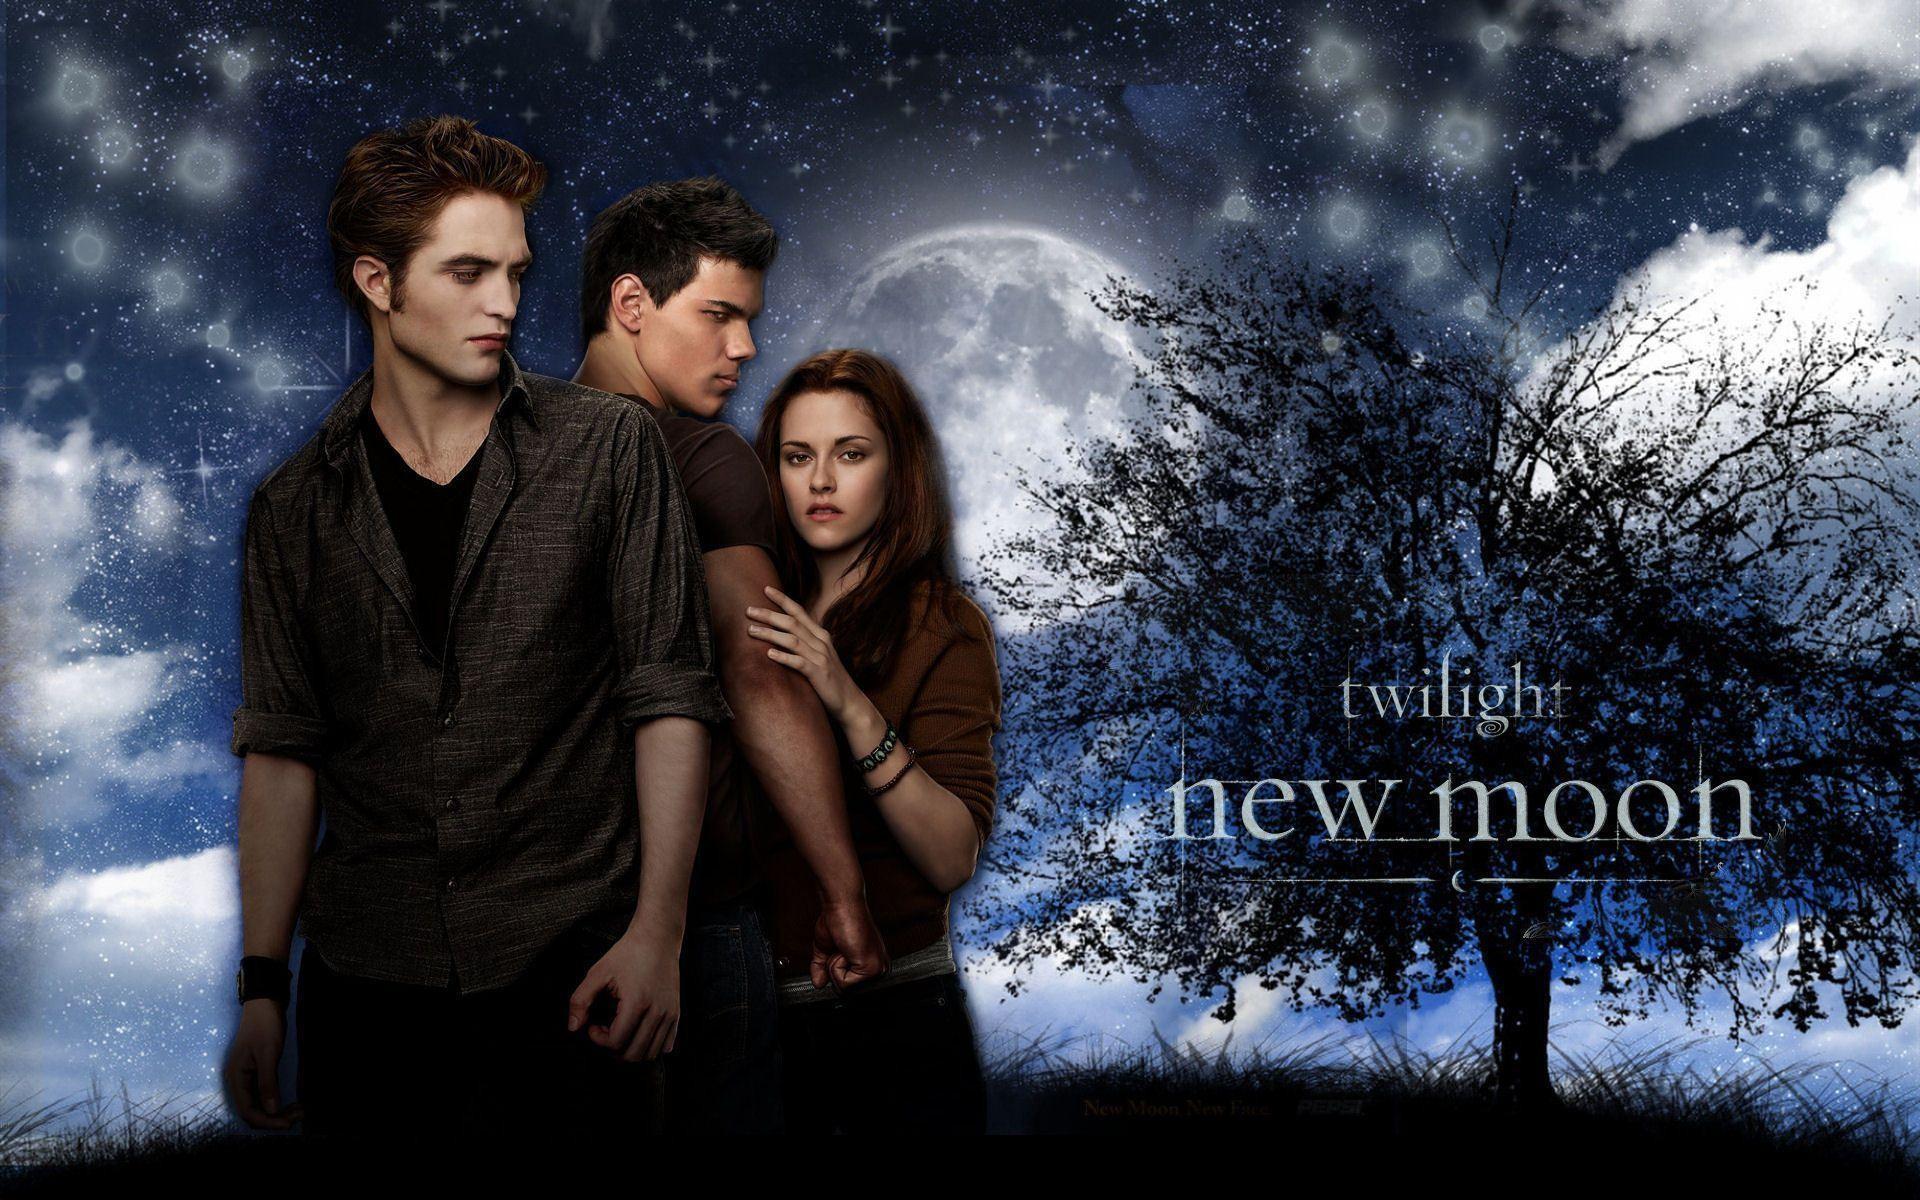 Twilight Saga New Moon Wallpaper 59 images 1920x1200